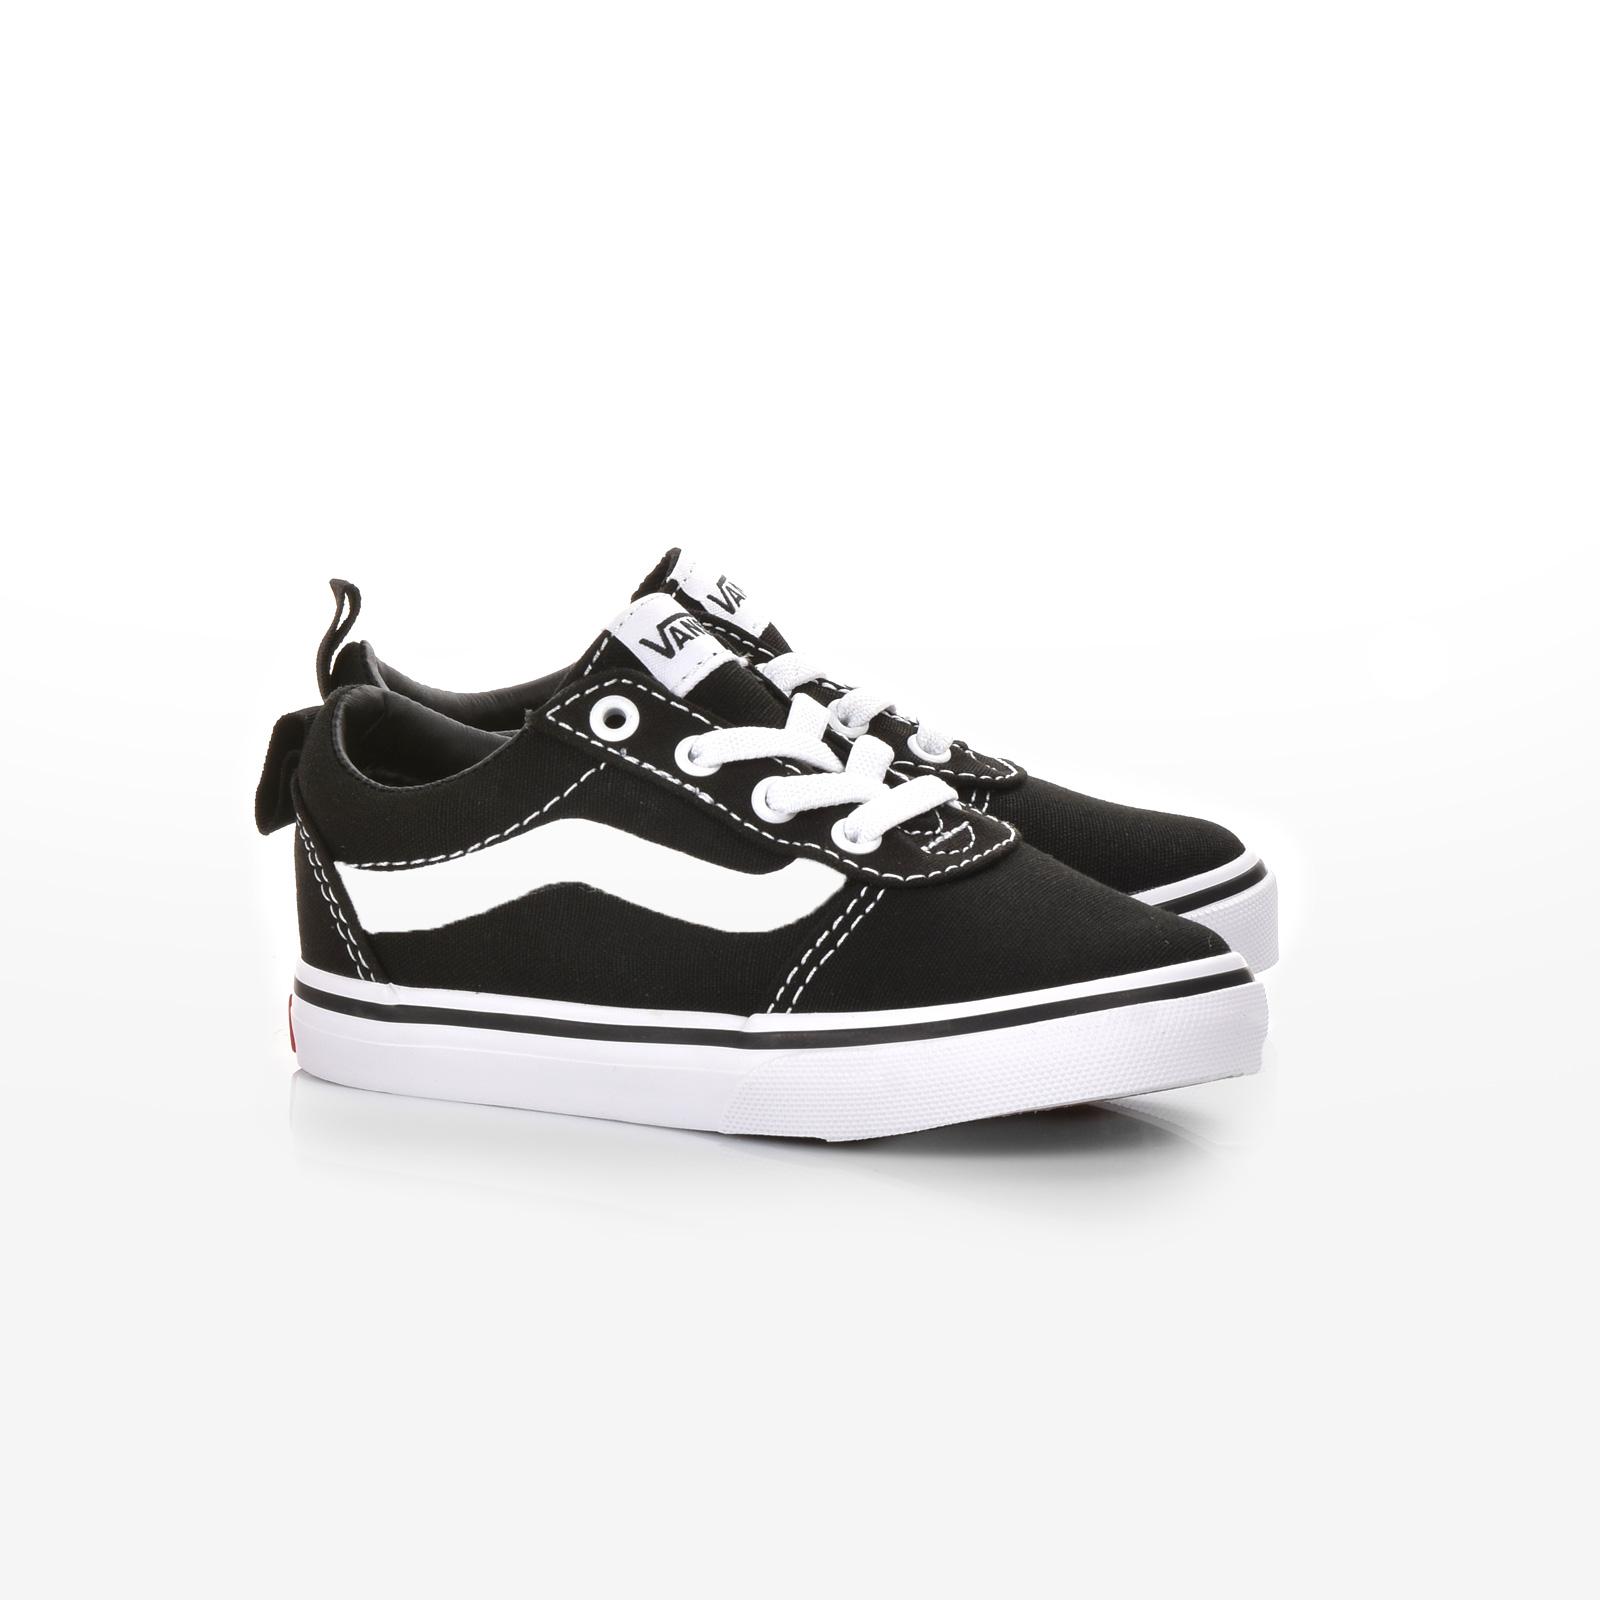 cebe3de57f9 Παιδικά Αθλητικά & Sneakers | VANS (Ταξινόμηση: Φθηνότερα) | Snif.gr